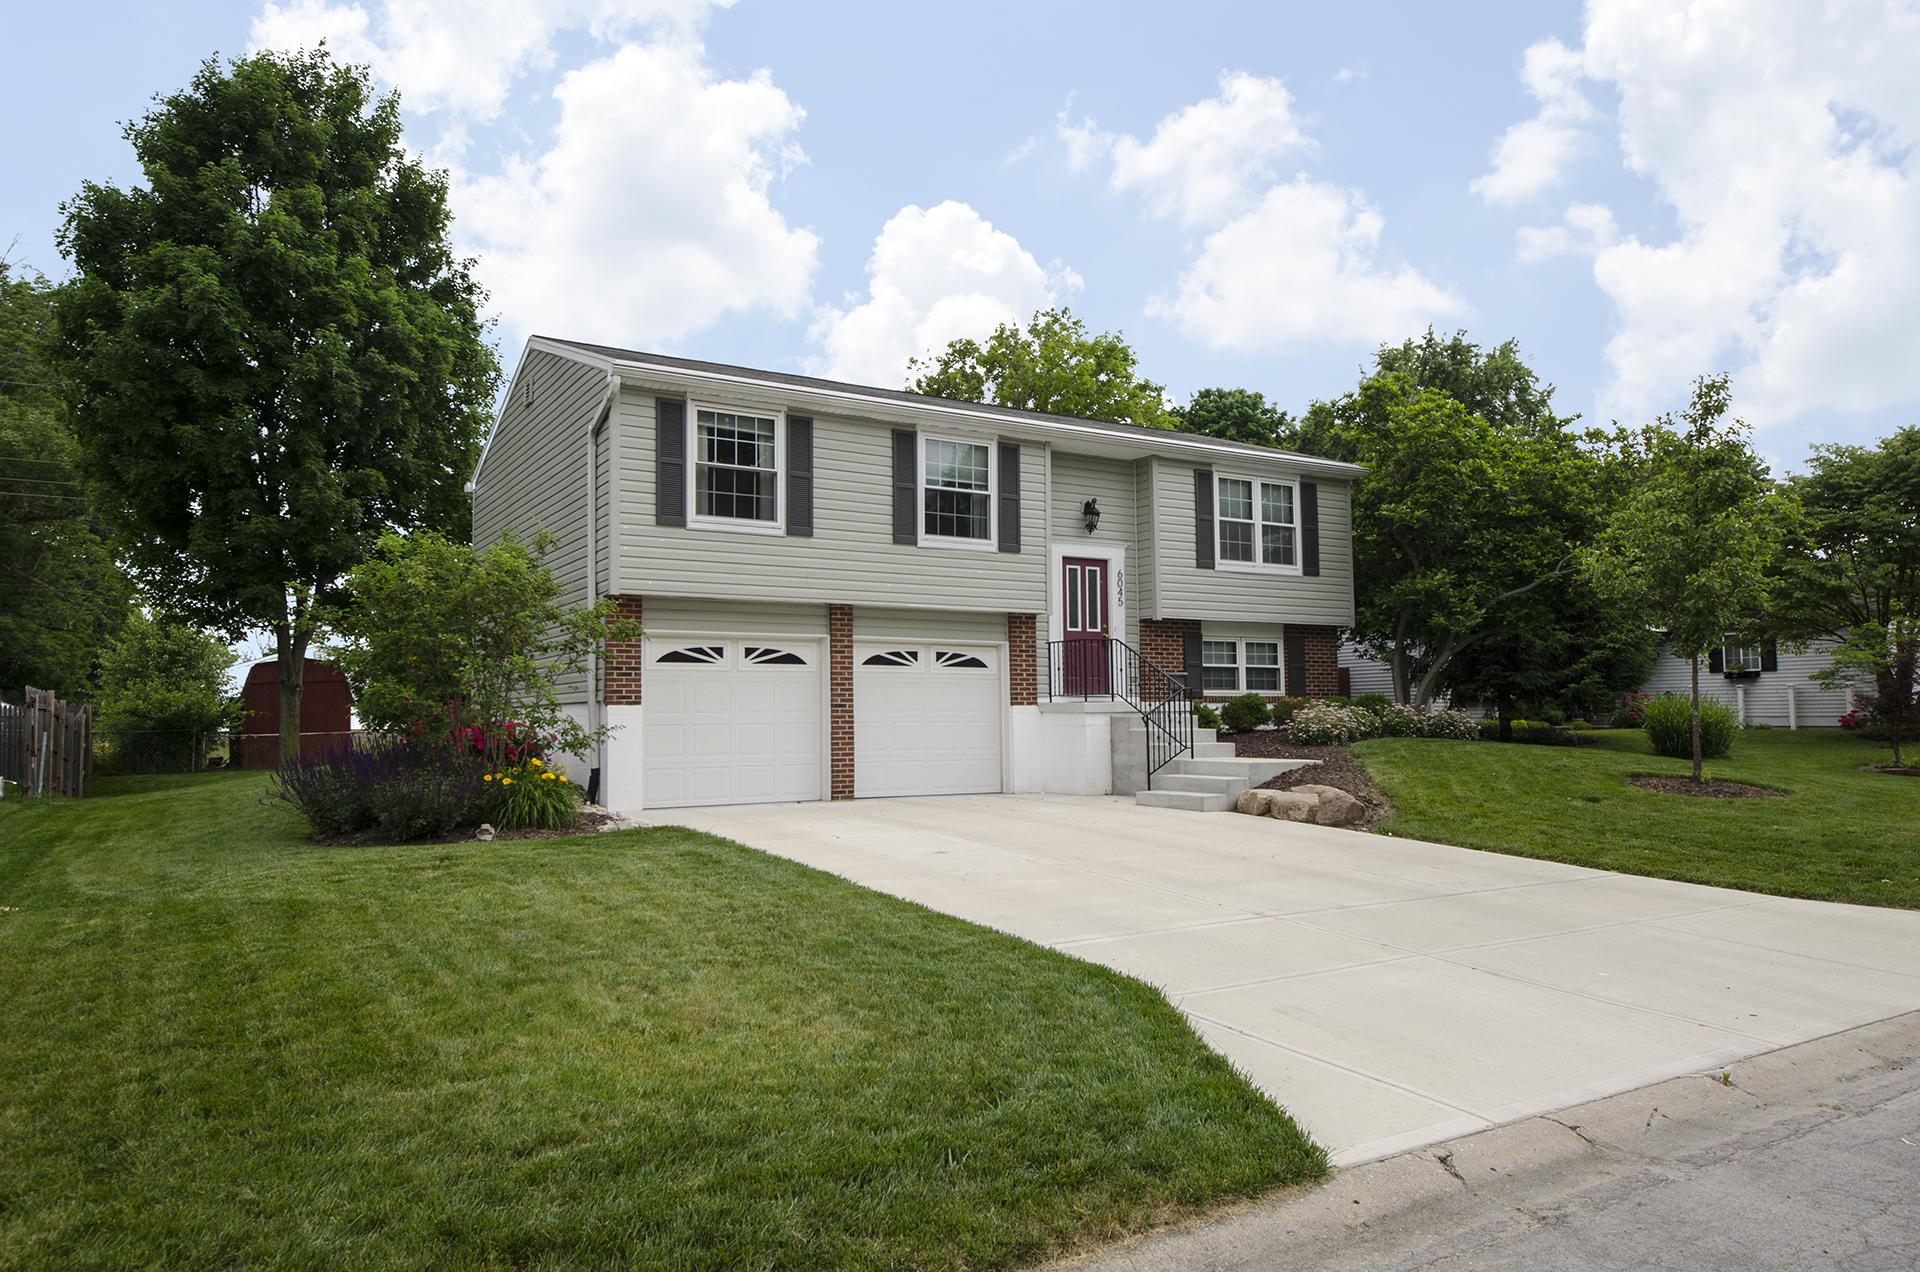 Awesome Design Homes Dayton Ideas - House Design Inspiration - ugg ...